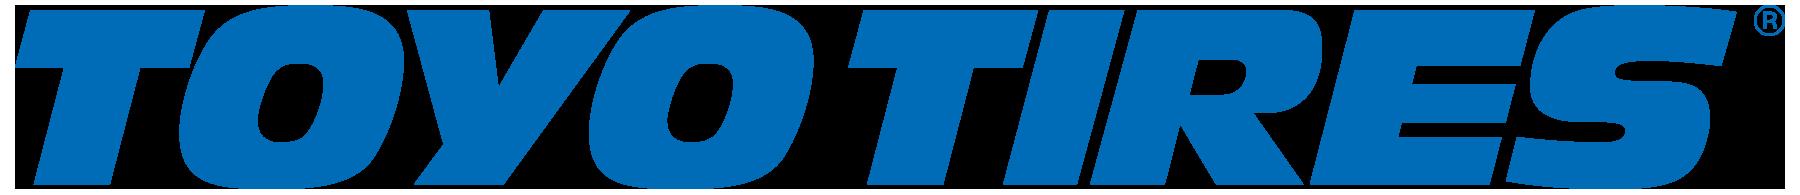 Toyo Tire Europe